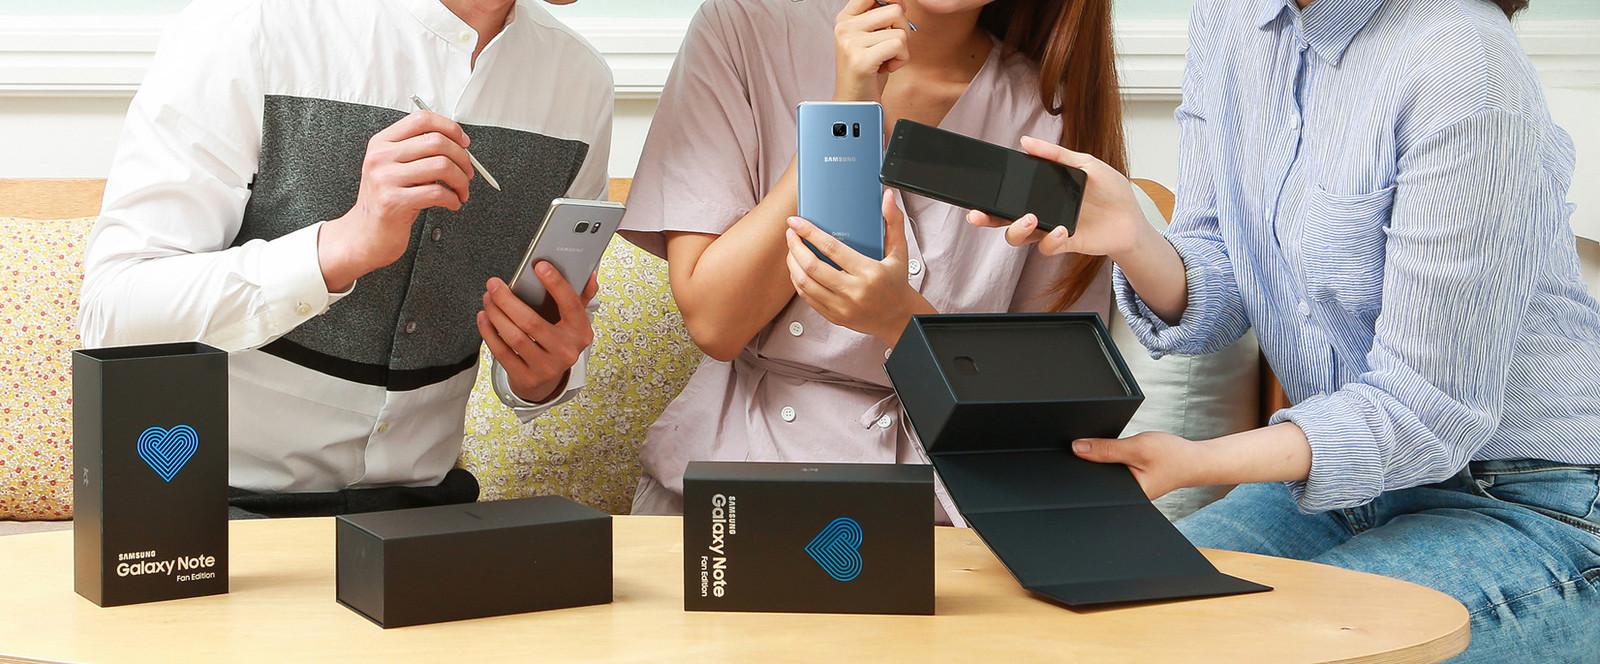 Samsung Galaxy Note FE (Fan Edition) hero (2)